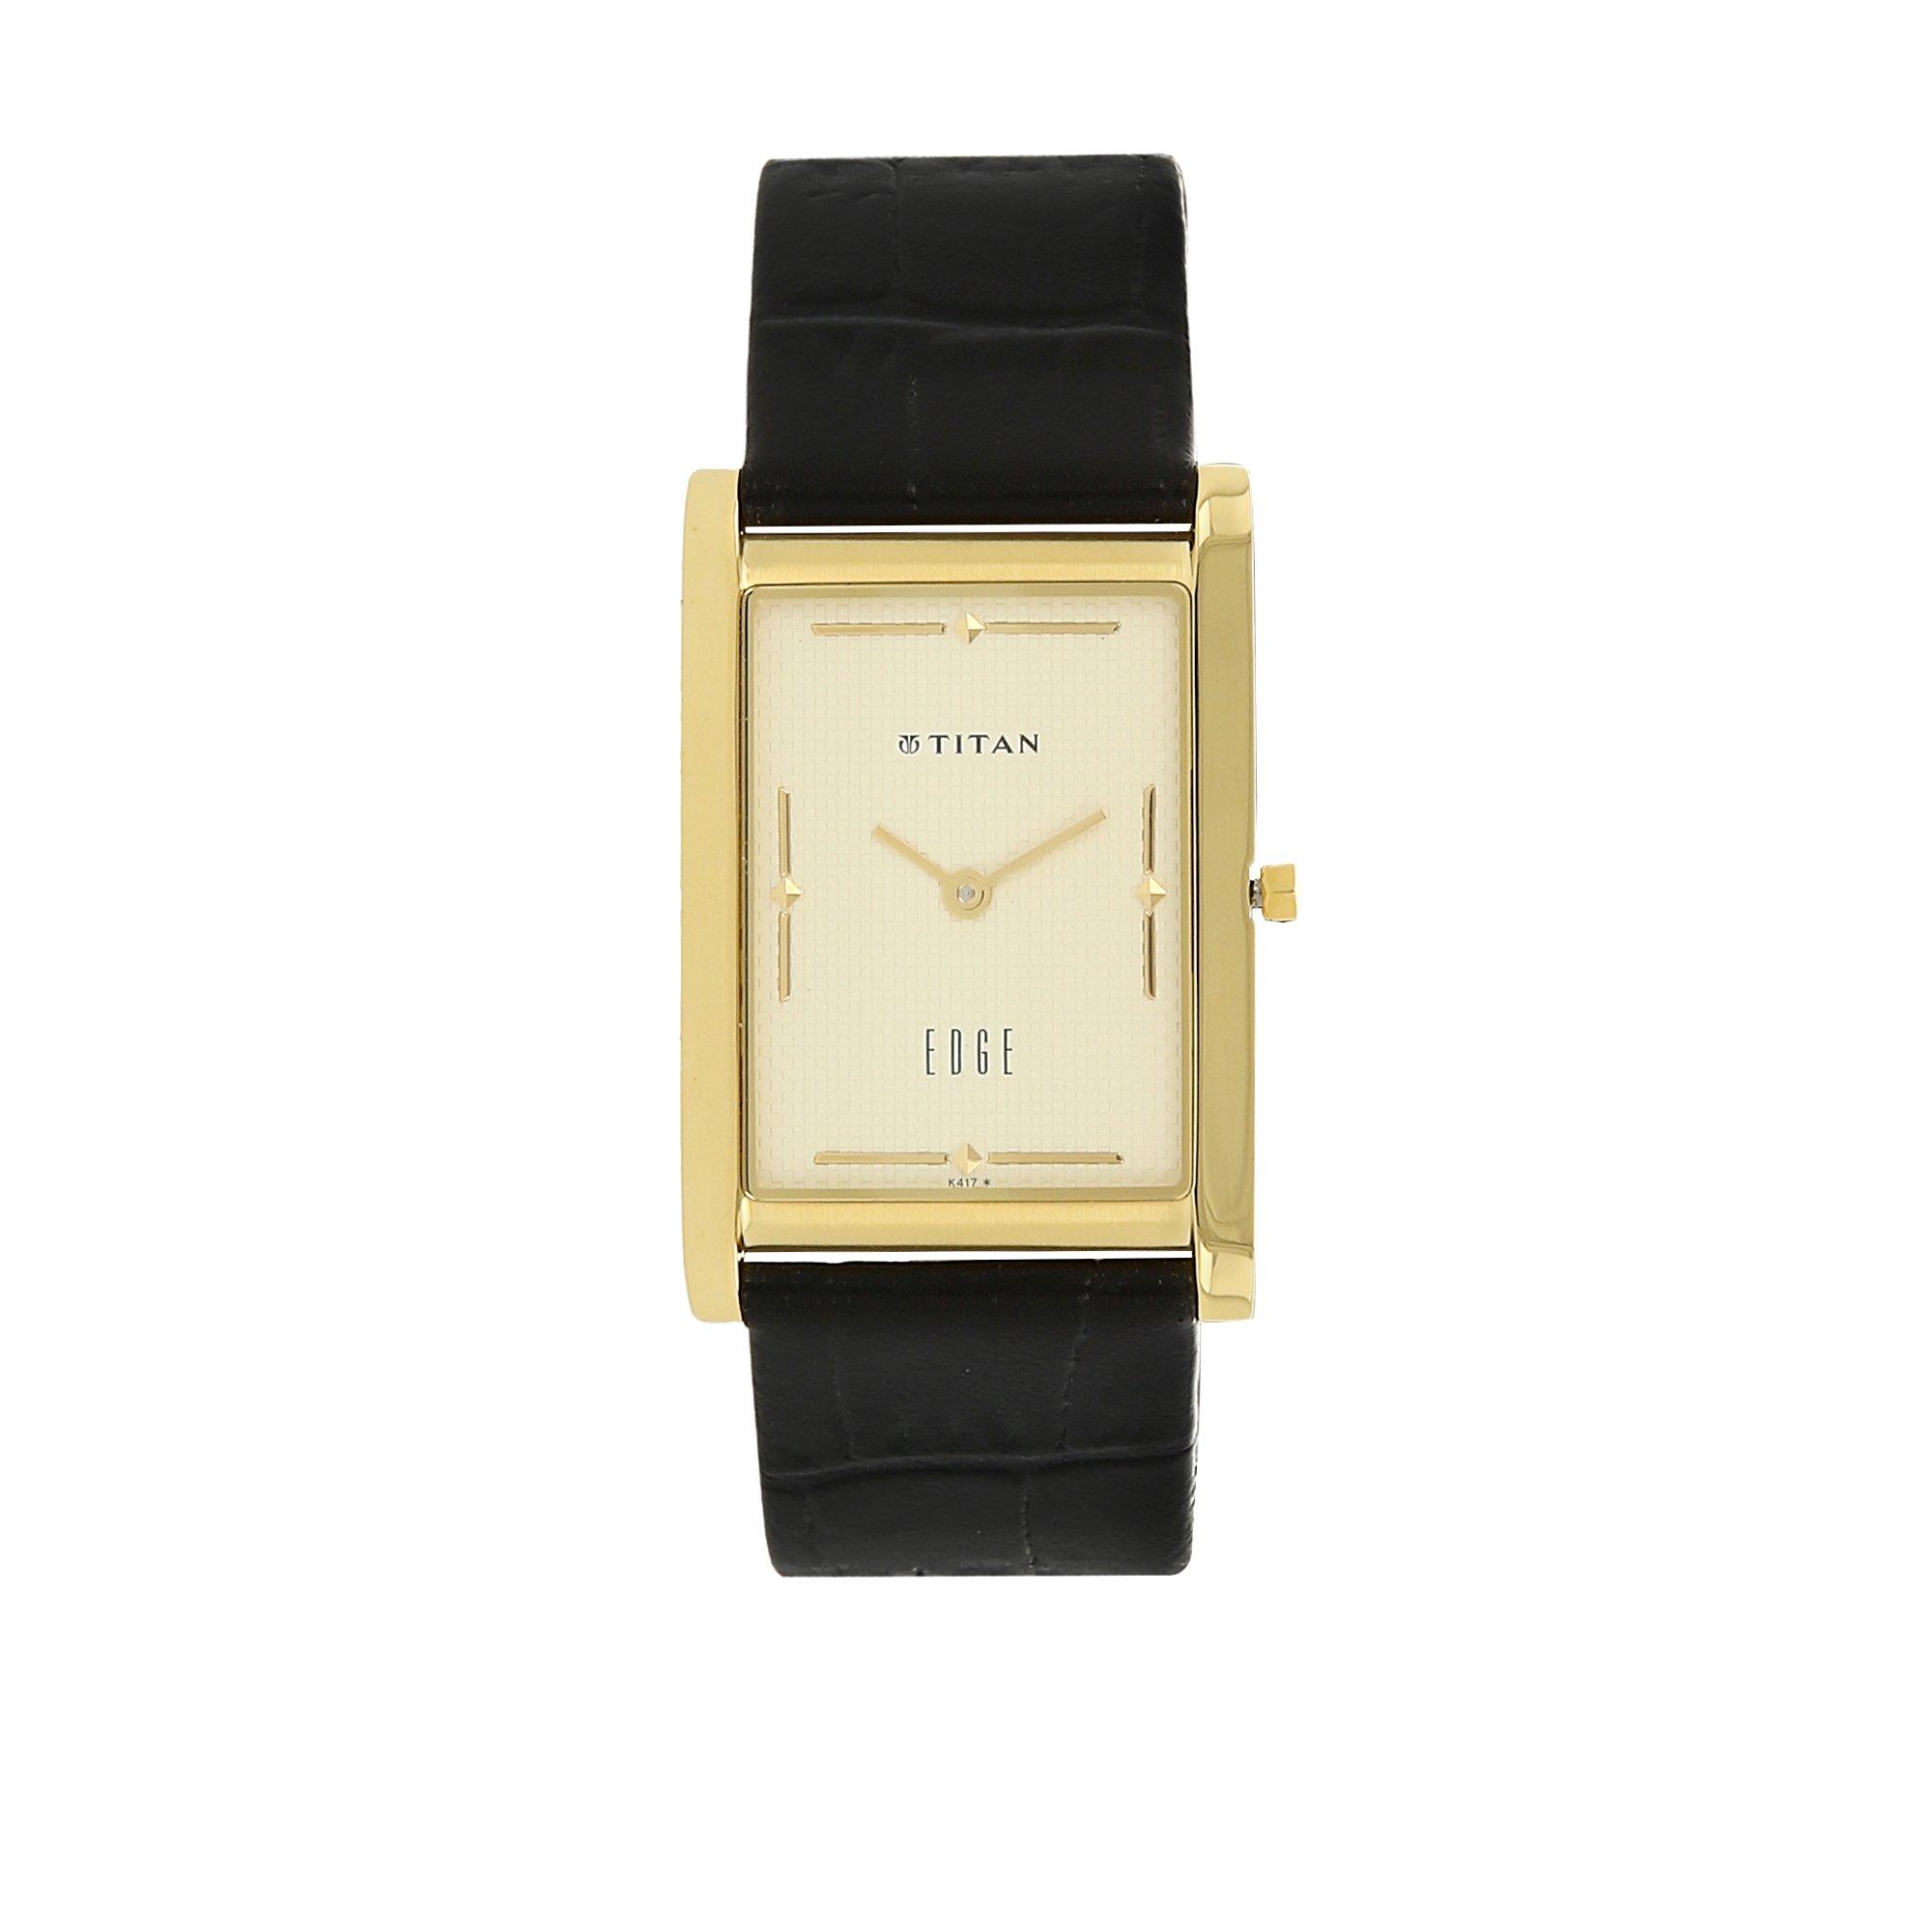 Titan Men's Edge Mineral Quartz Glass Slim Analog Wrist Watch- Ultra Slim with Metal/ Leather Strap